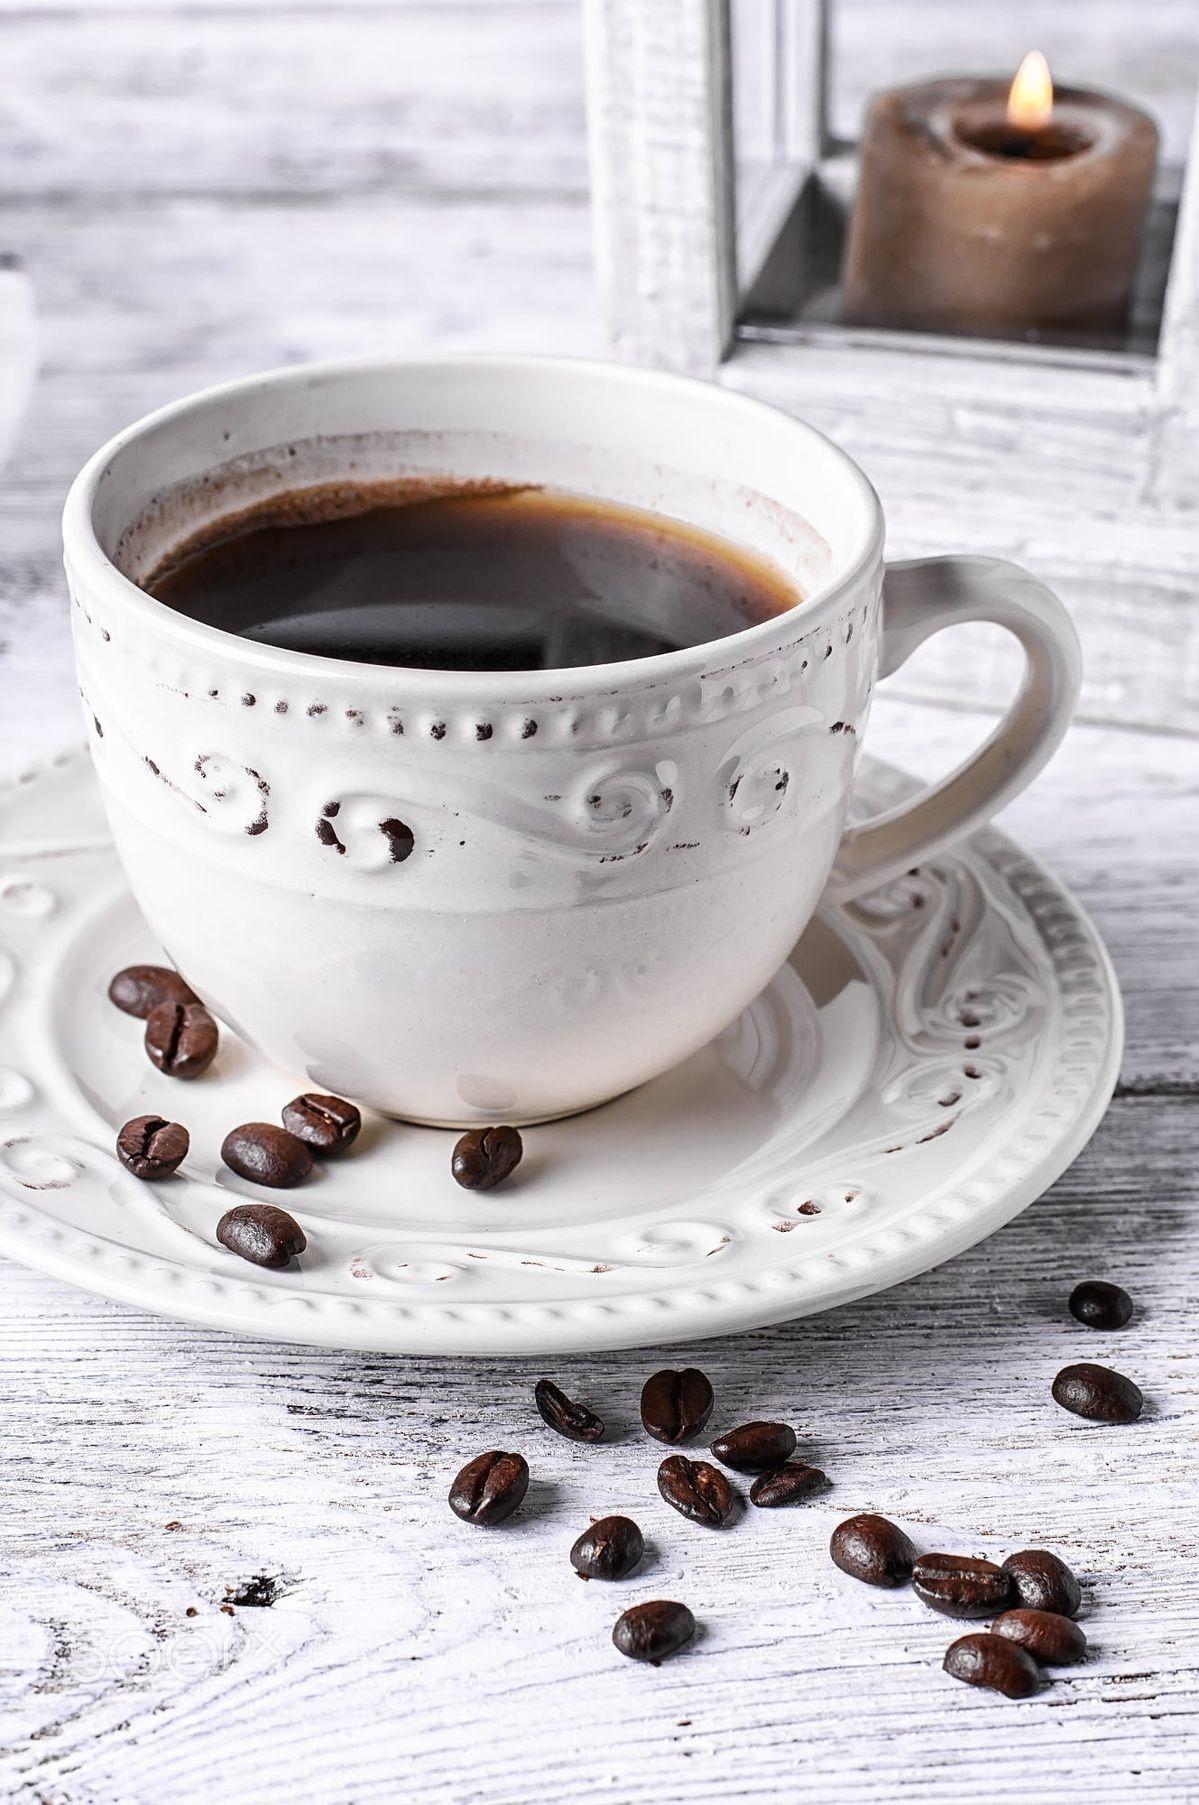 чашечка ароматного кофе картинки фото пойму кто